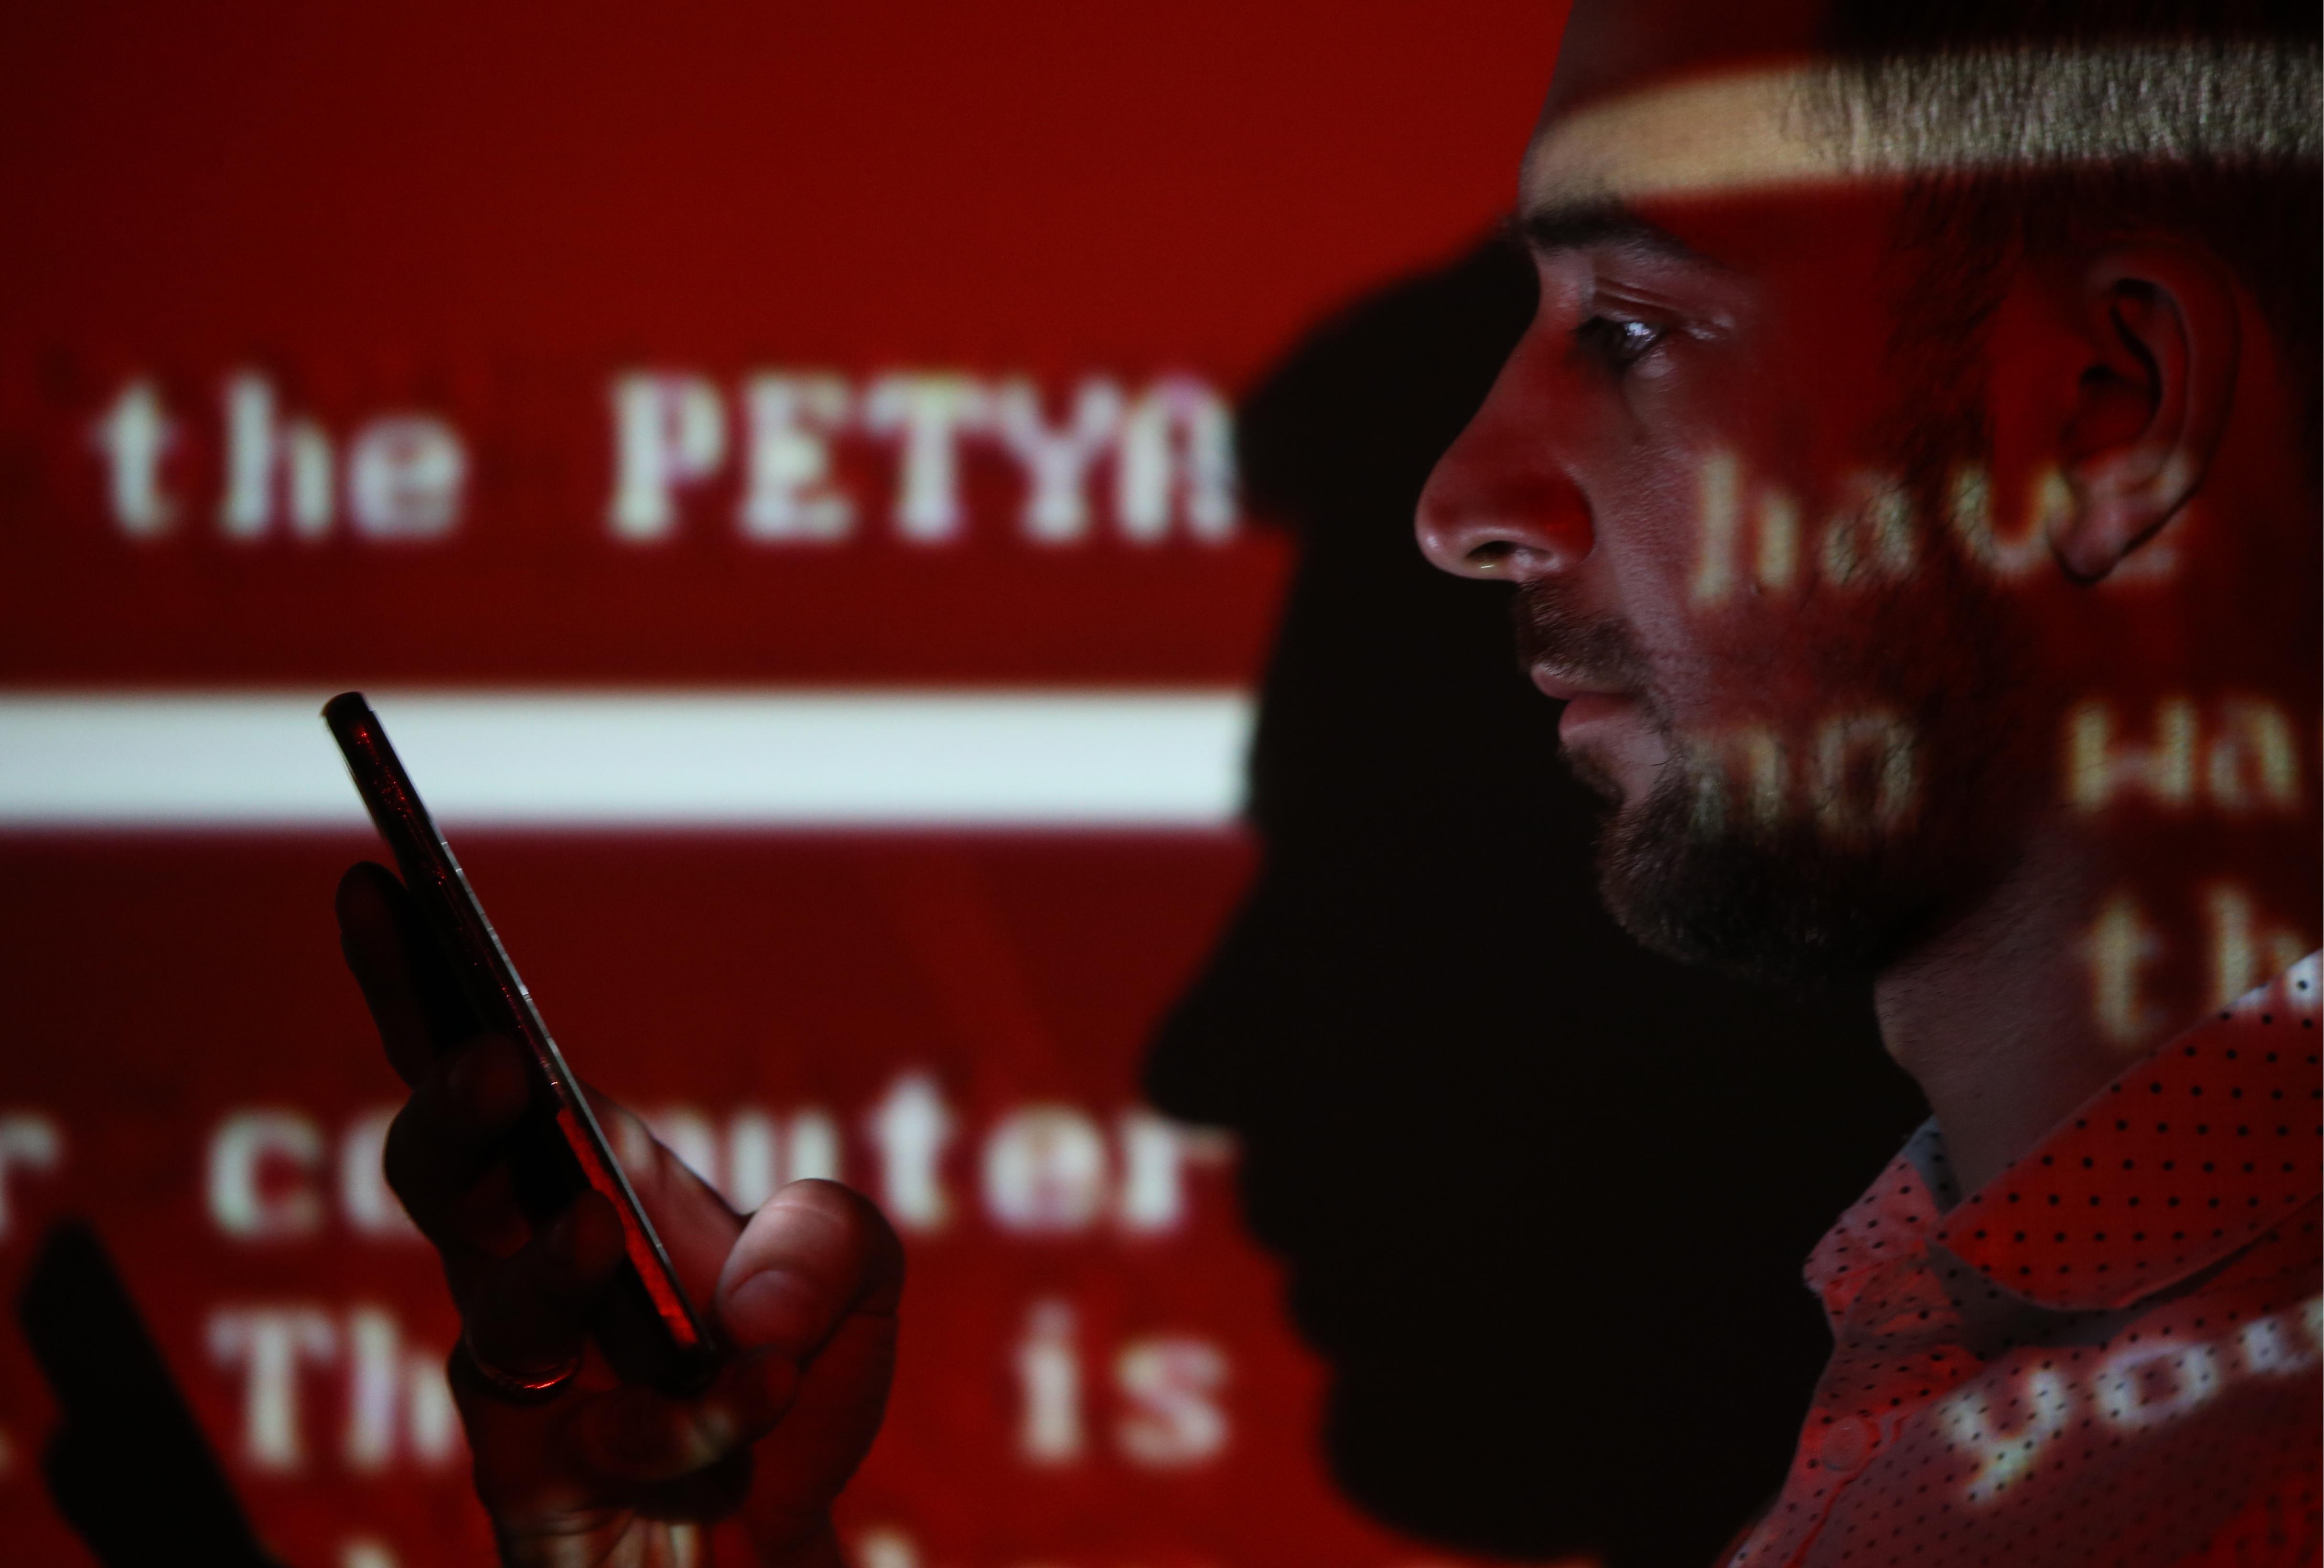 Petya ransomware cyber attack